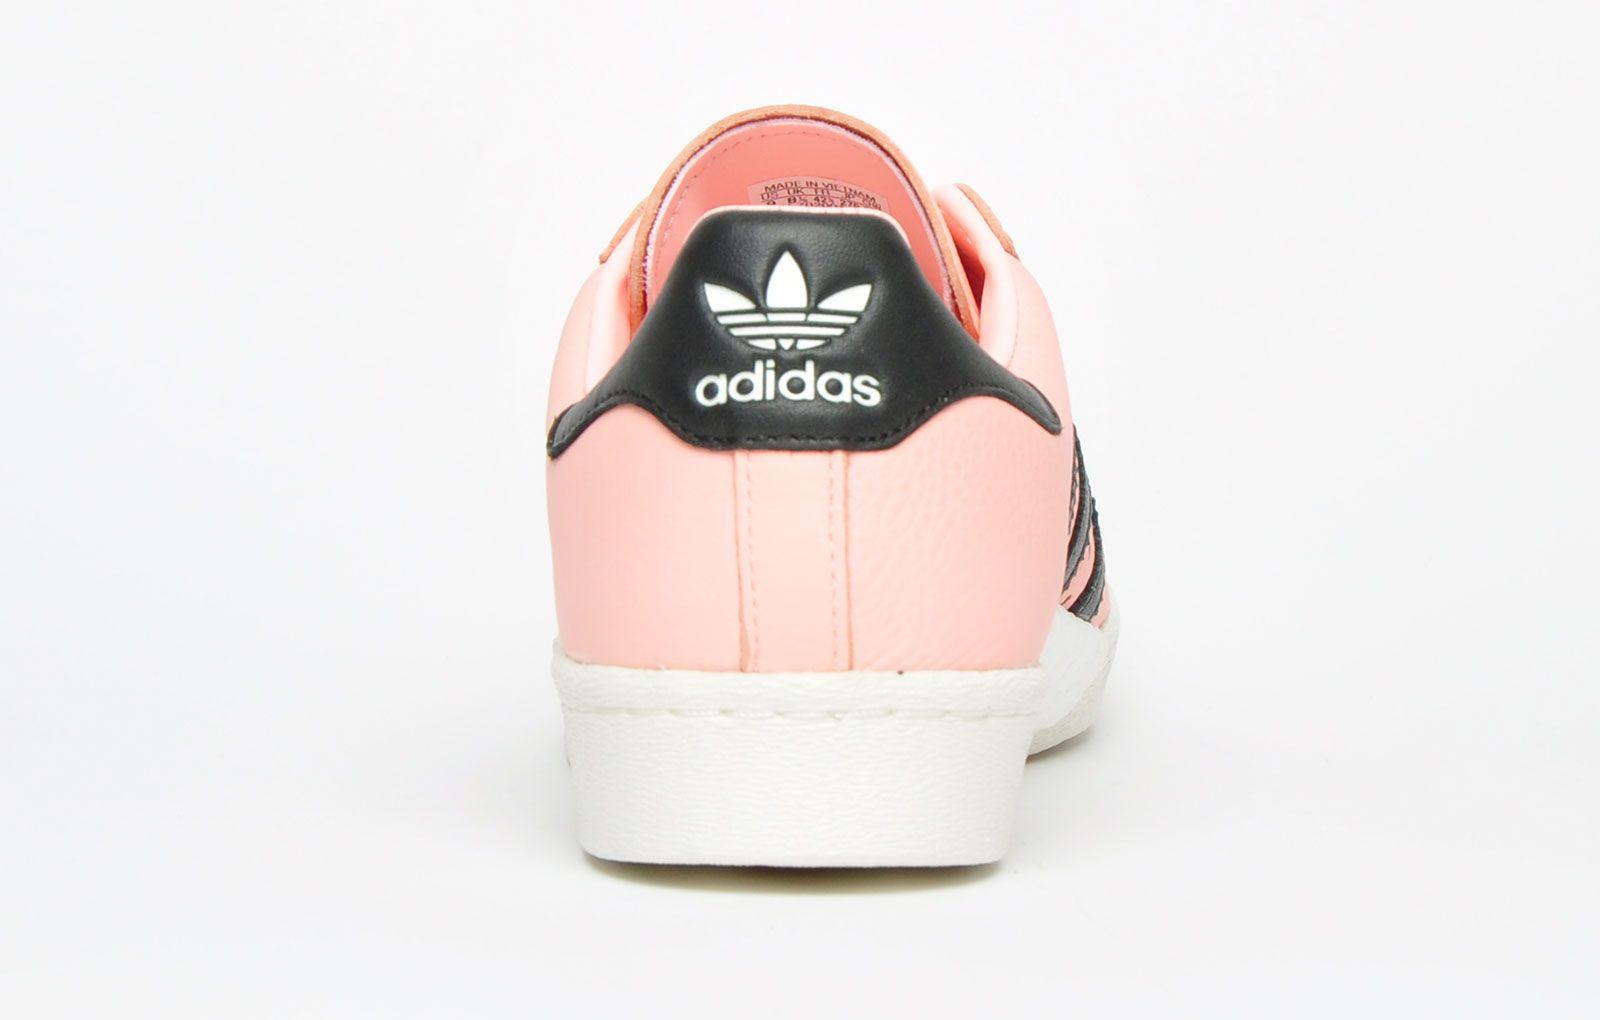 Adidas Orignals Superstar Boost Mens